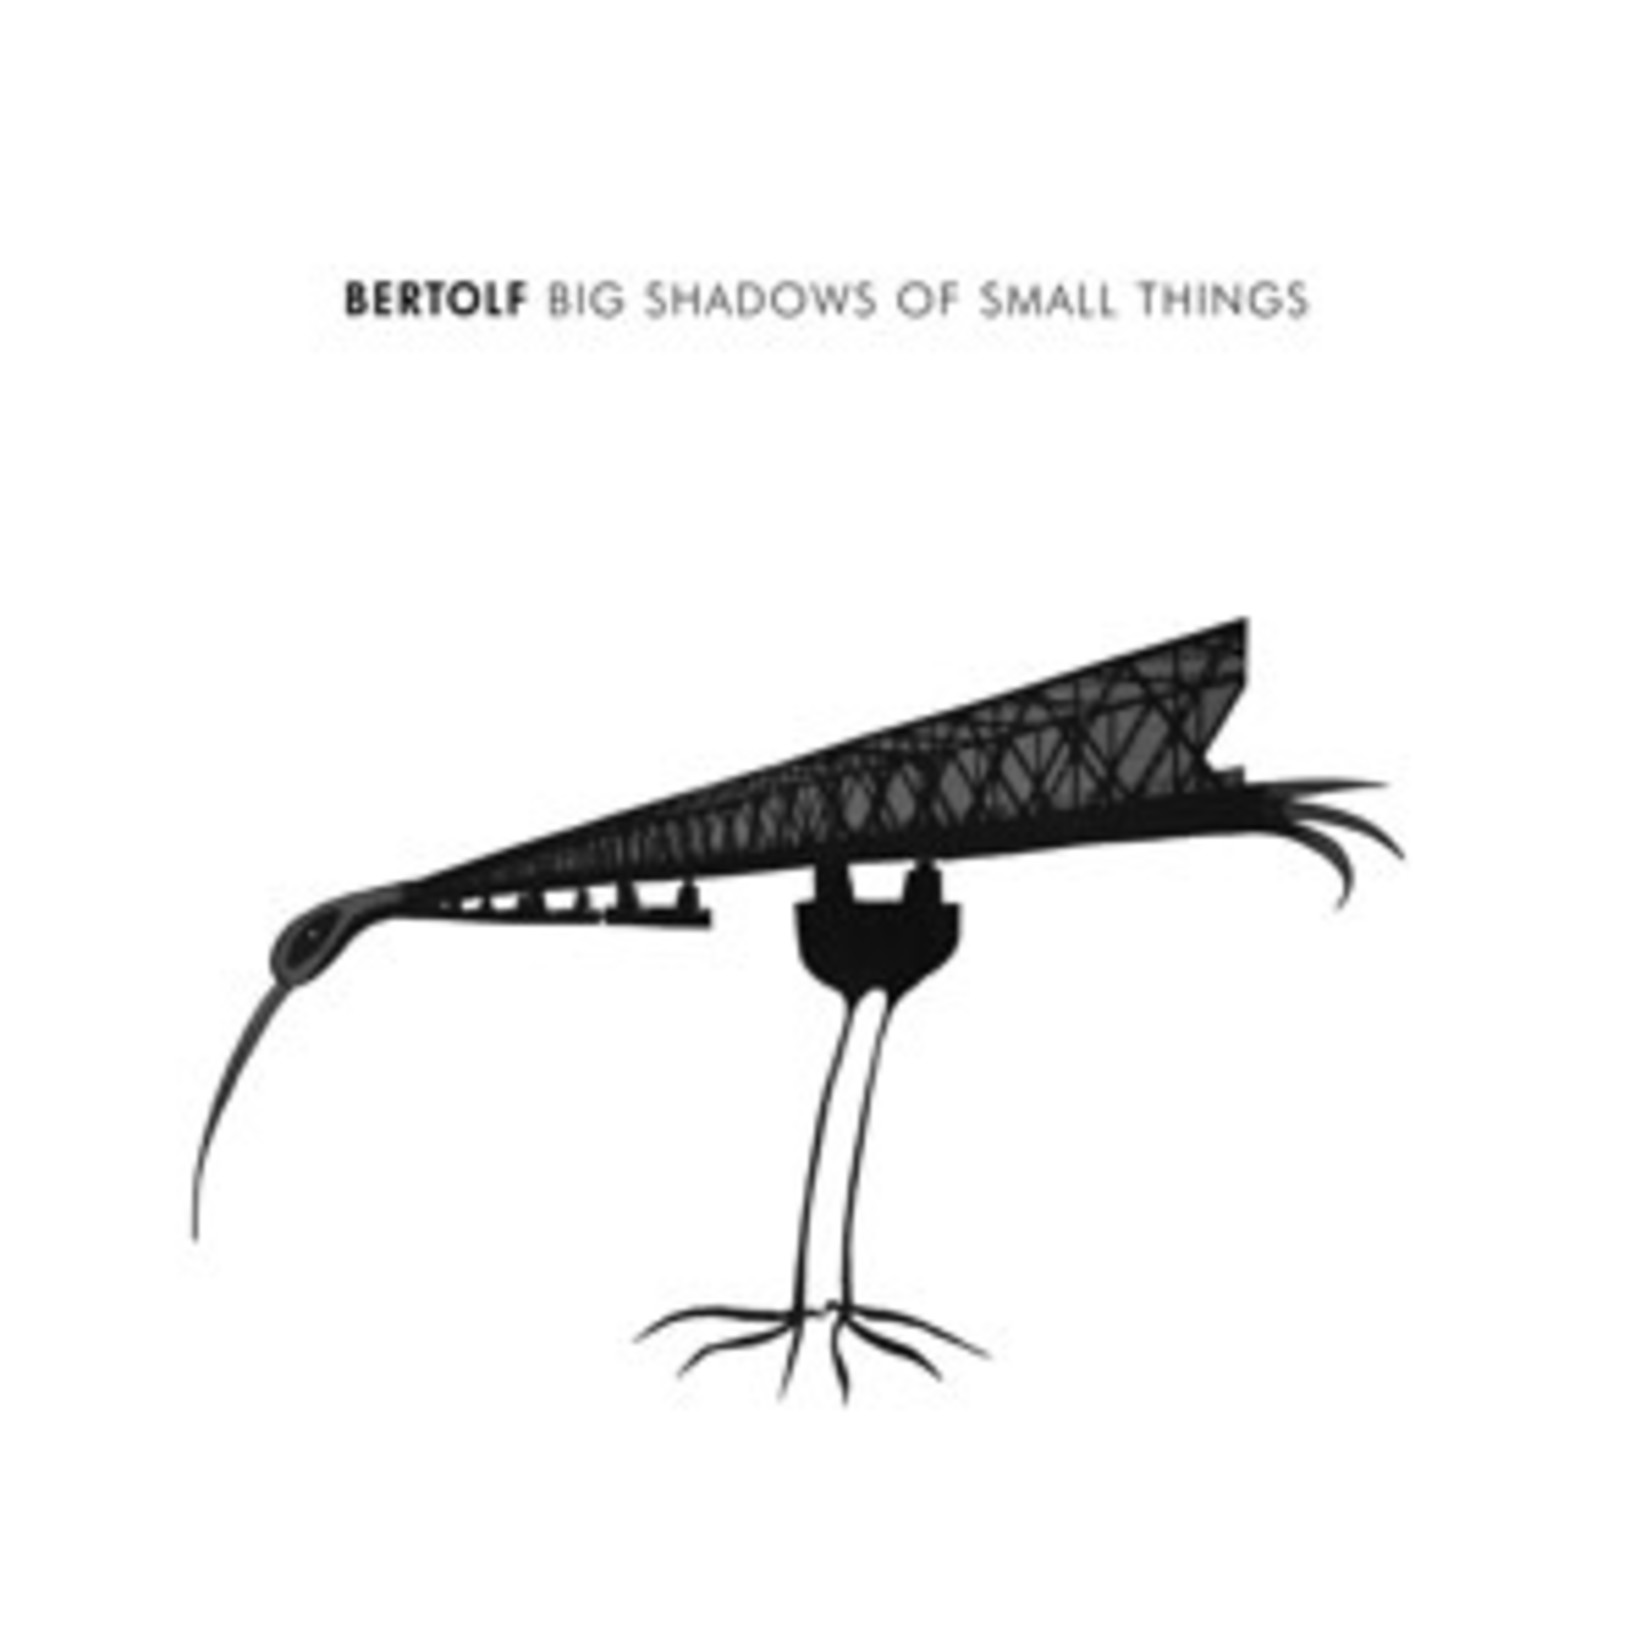 BERTOLF  - Big Shadows of Small Things   (VINYL)